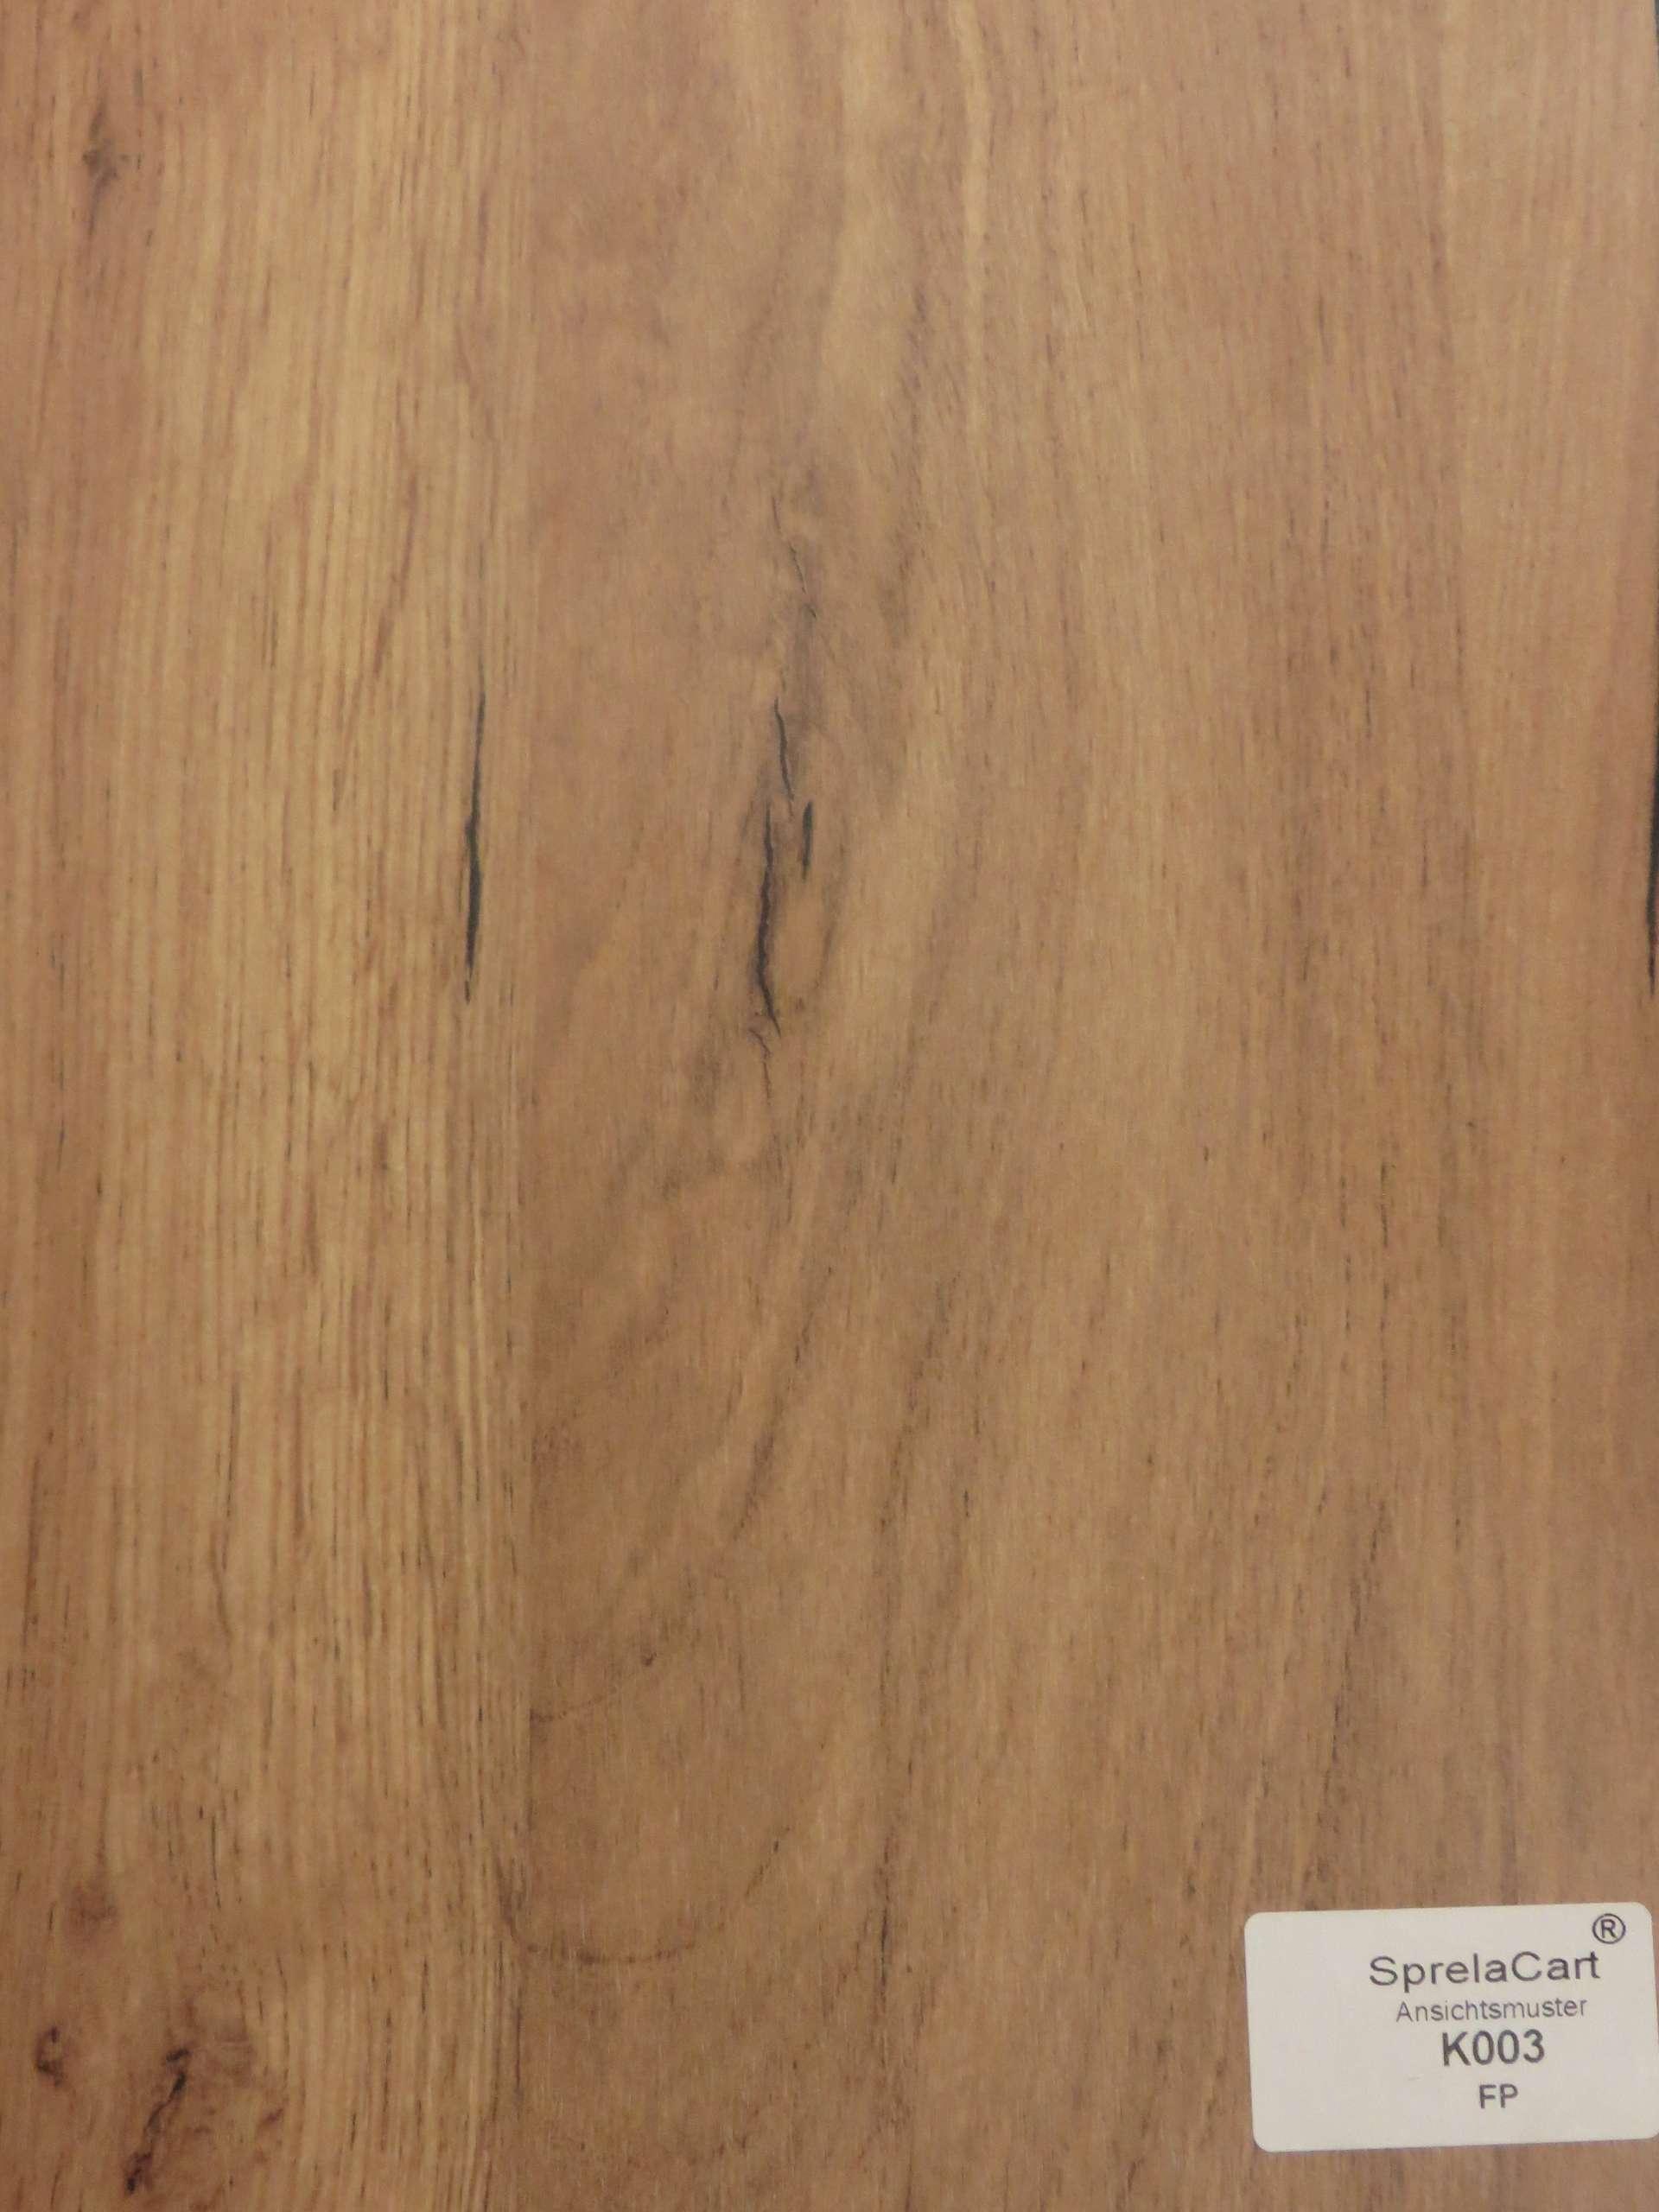 Kuchenarbeitsplatte K003 Fp Craft Oak Gold Sprela